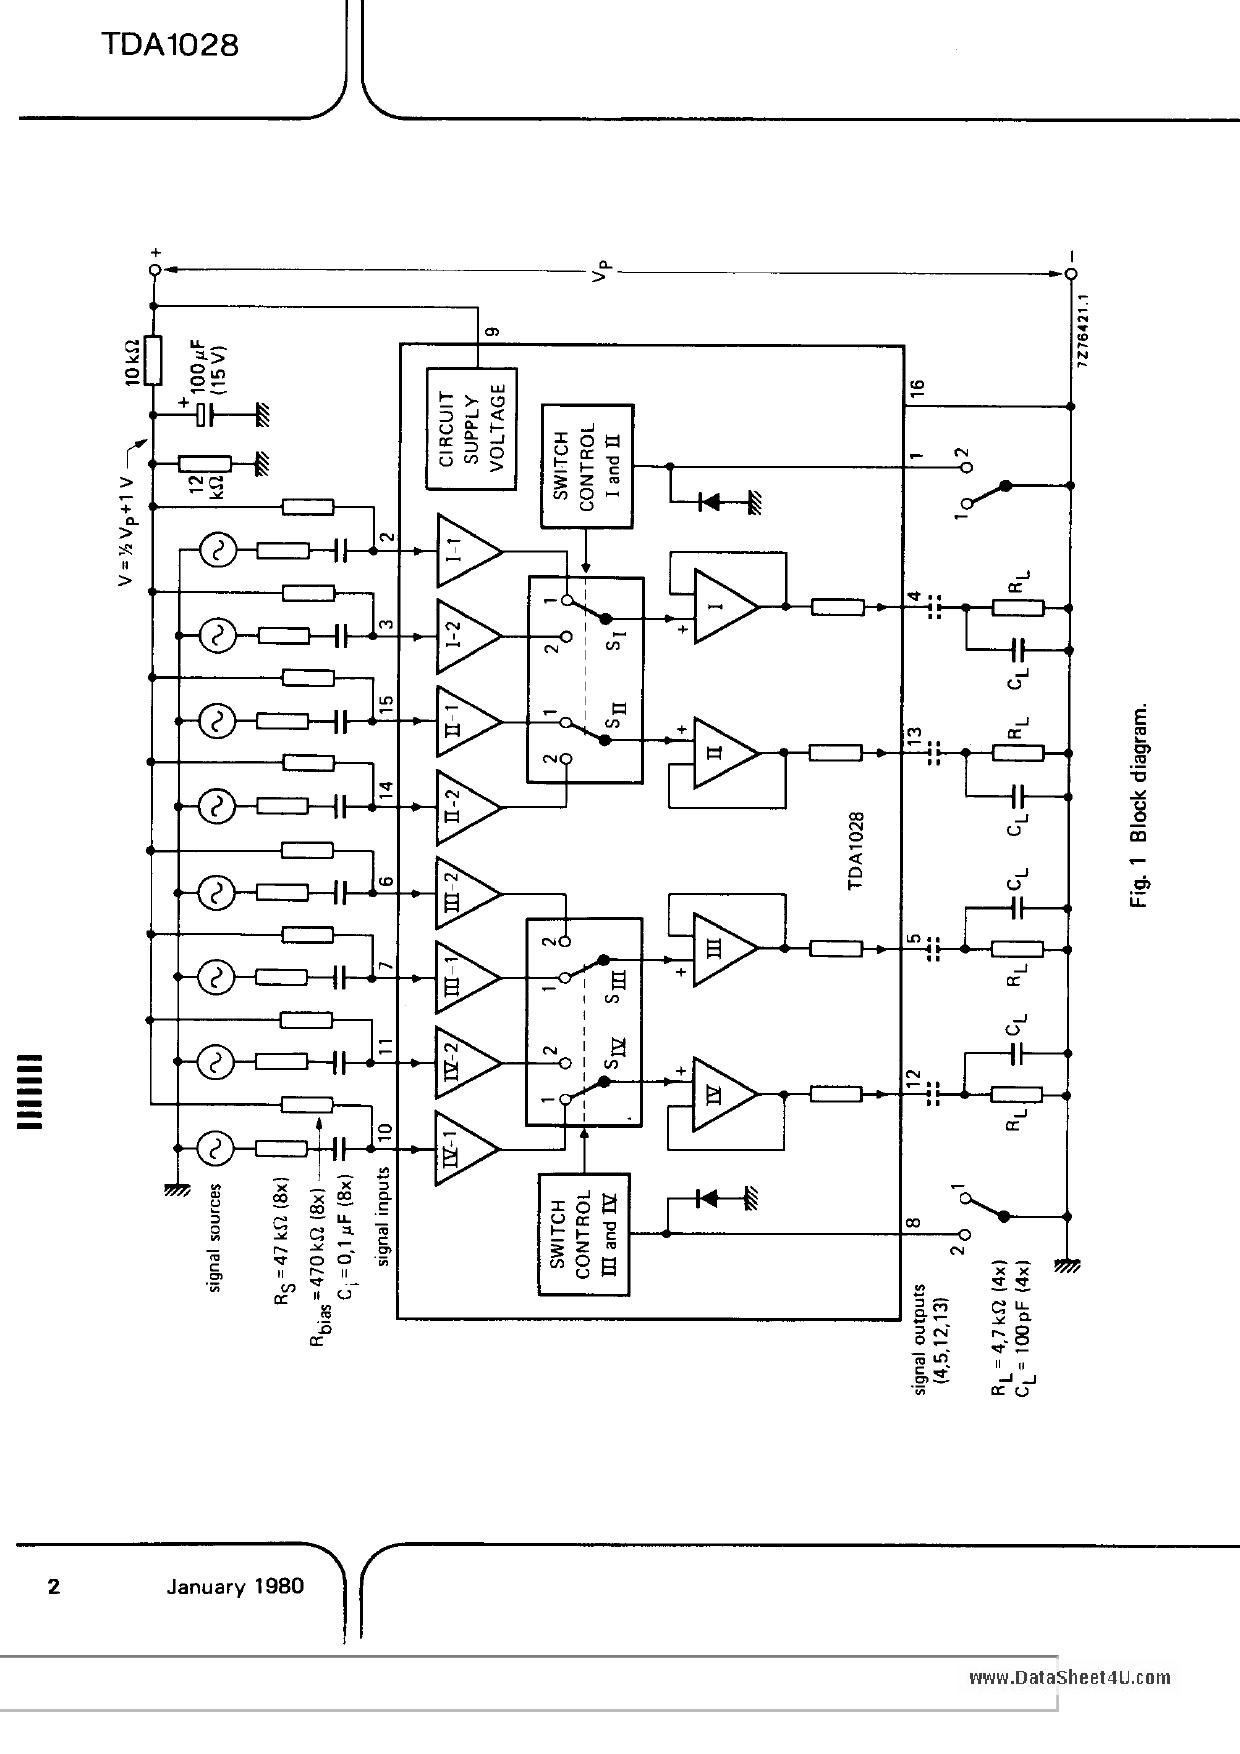 TDA1028 pdf schematic